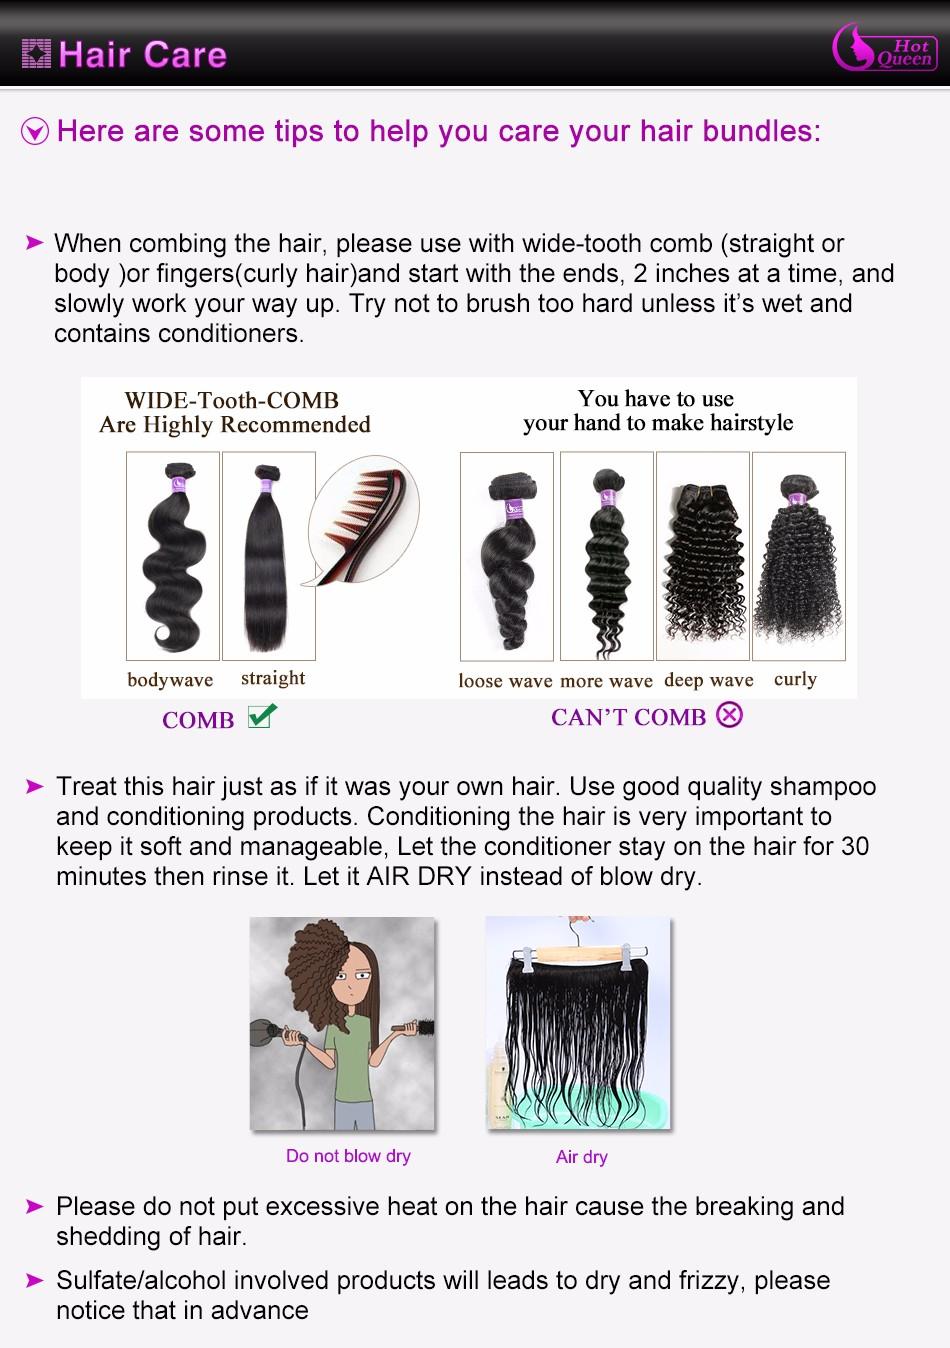 5-hair care